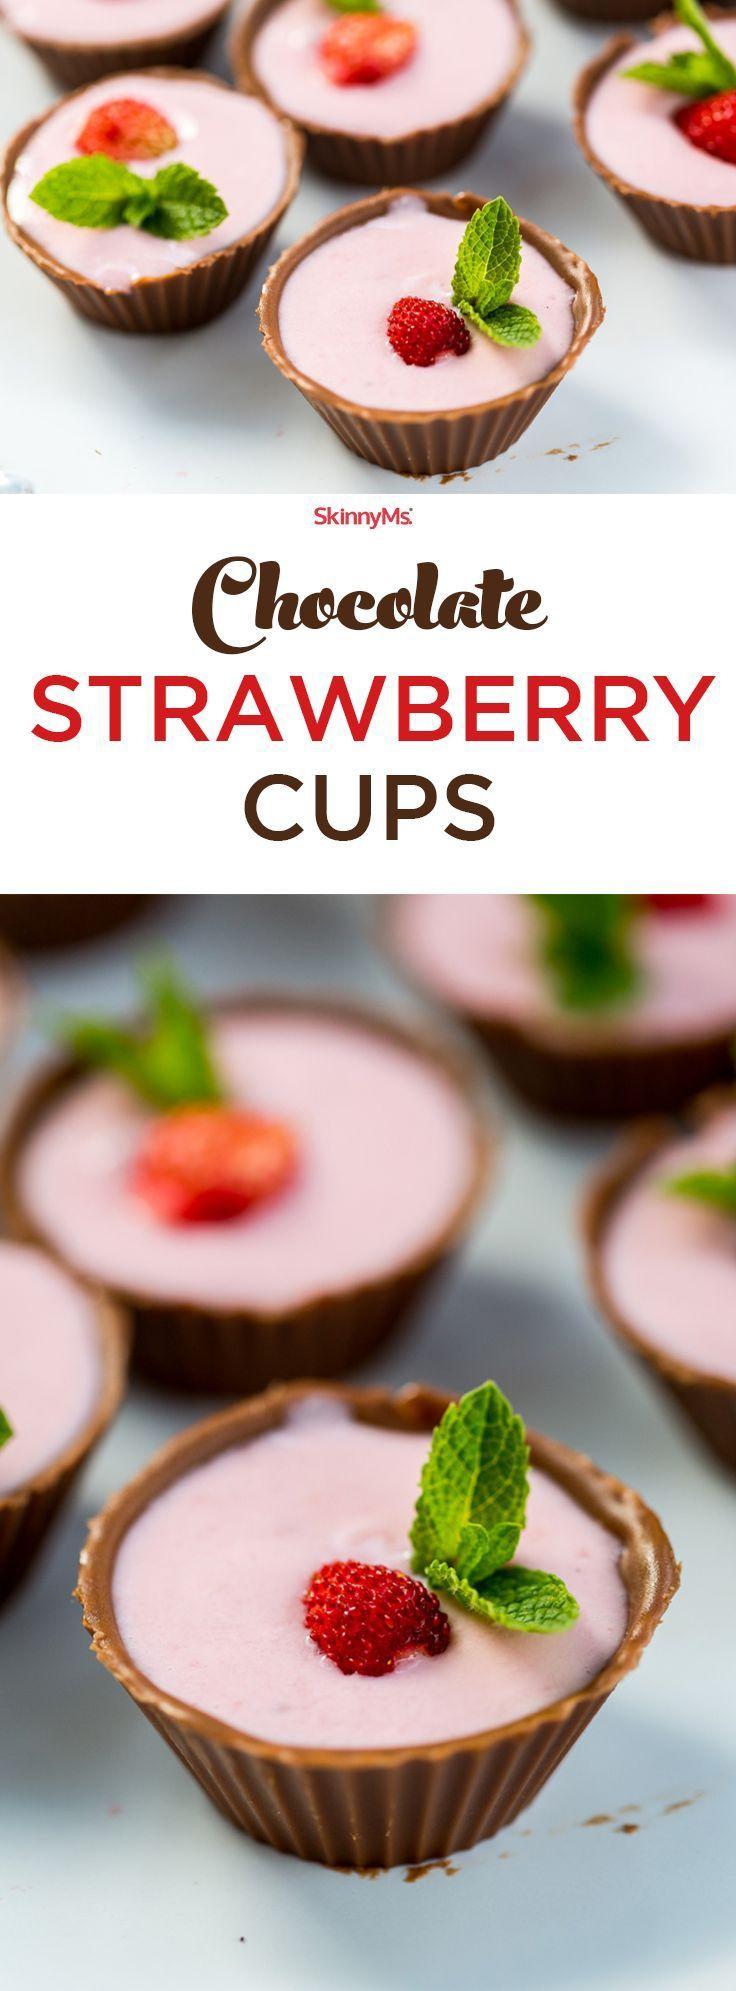 Chocolate Strawberry Cups   Recipe   Desserts, Baking ...